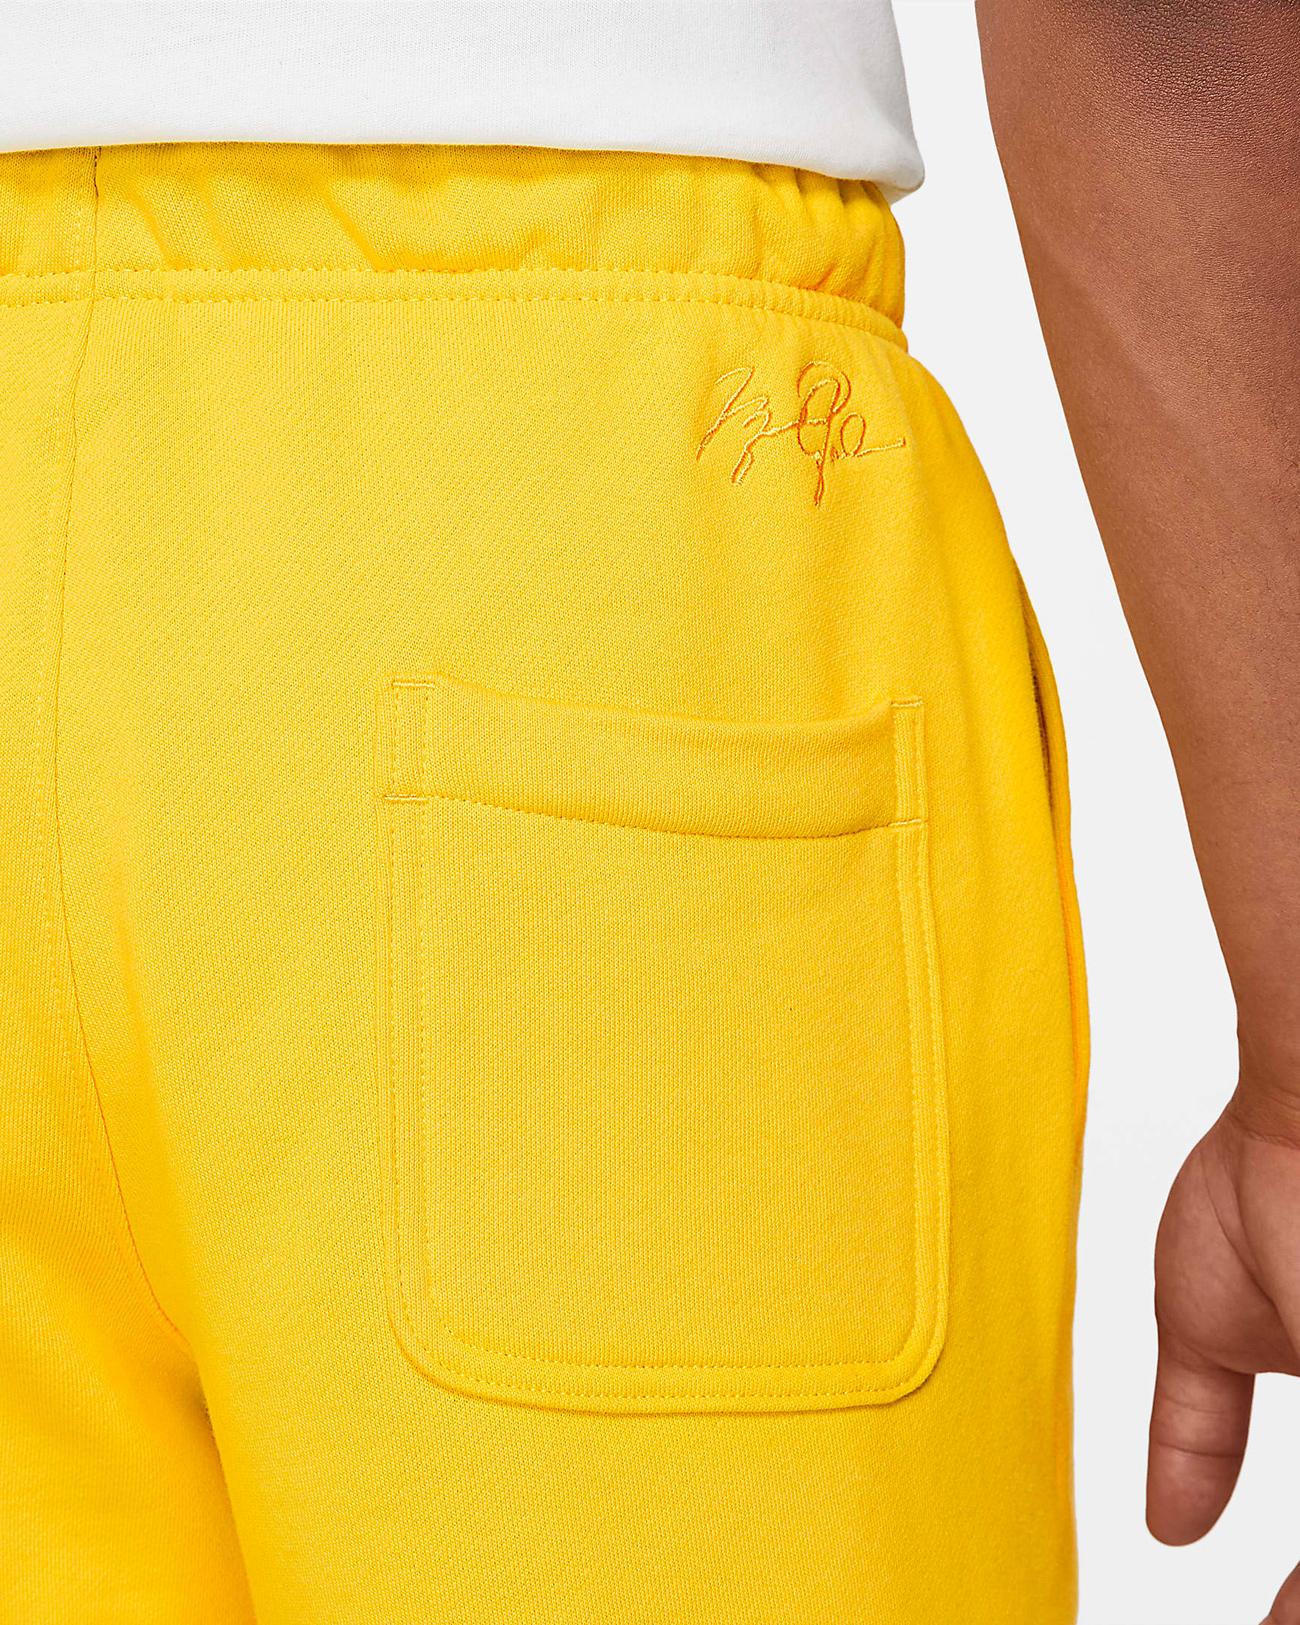 jordan-4-lightning-2021-tour-yellow-shorts-4